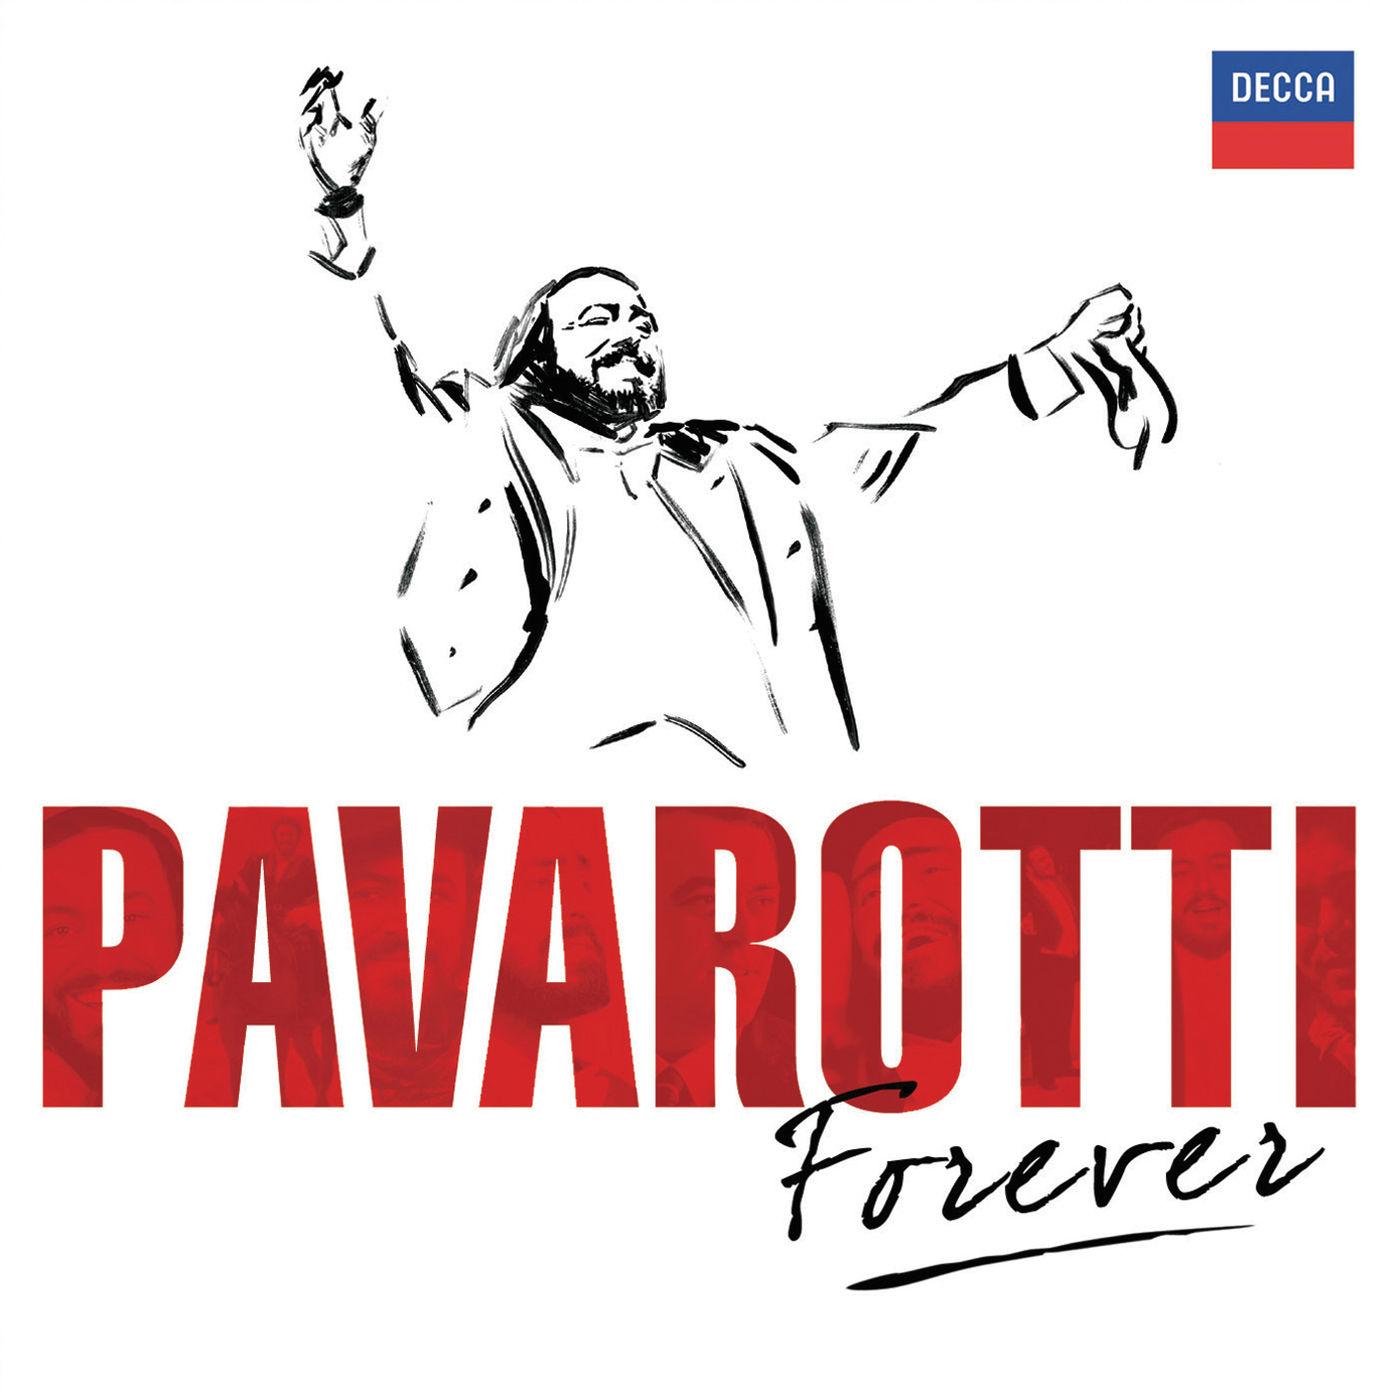 Luciano Pavarotti - Pavarotti Forever (2009).mp3 - 320 Kbps